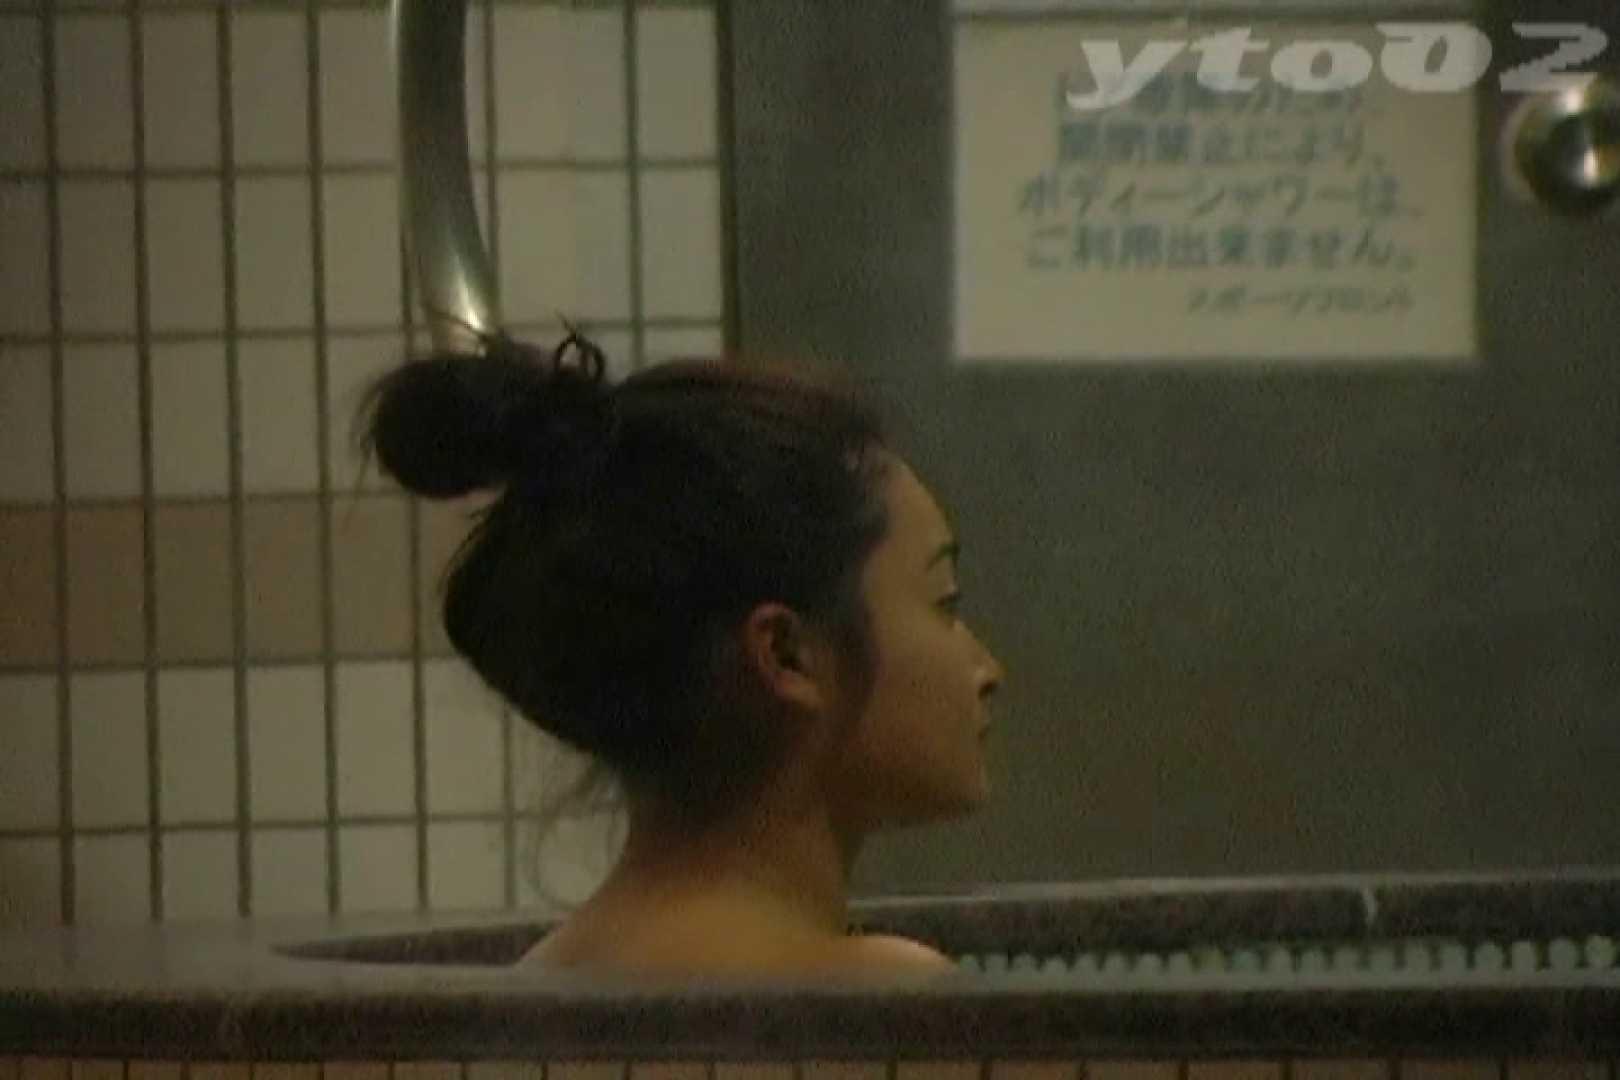 ▲復活限定▲合宿ホテル女風呂盗撮 Vol.11 入浴  79pic 73